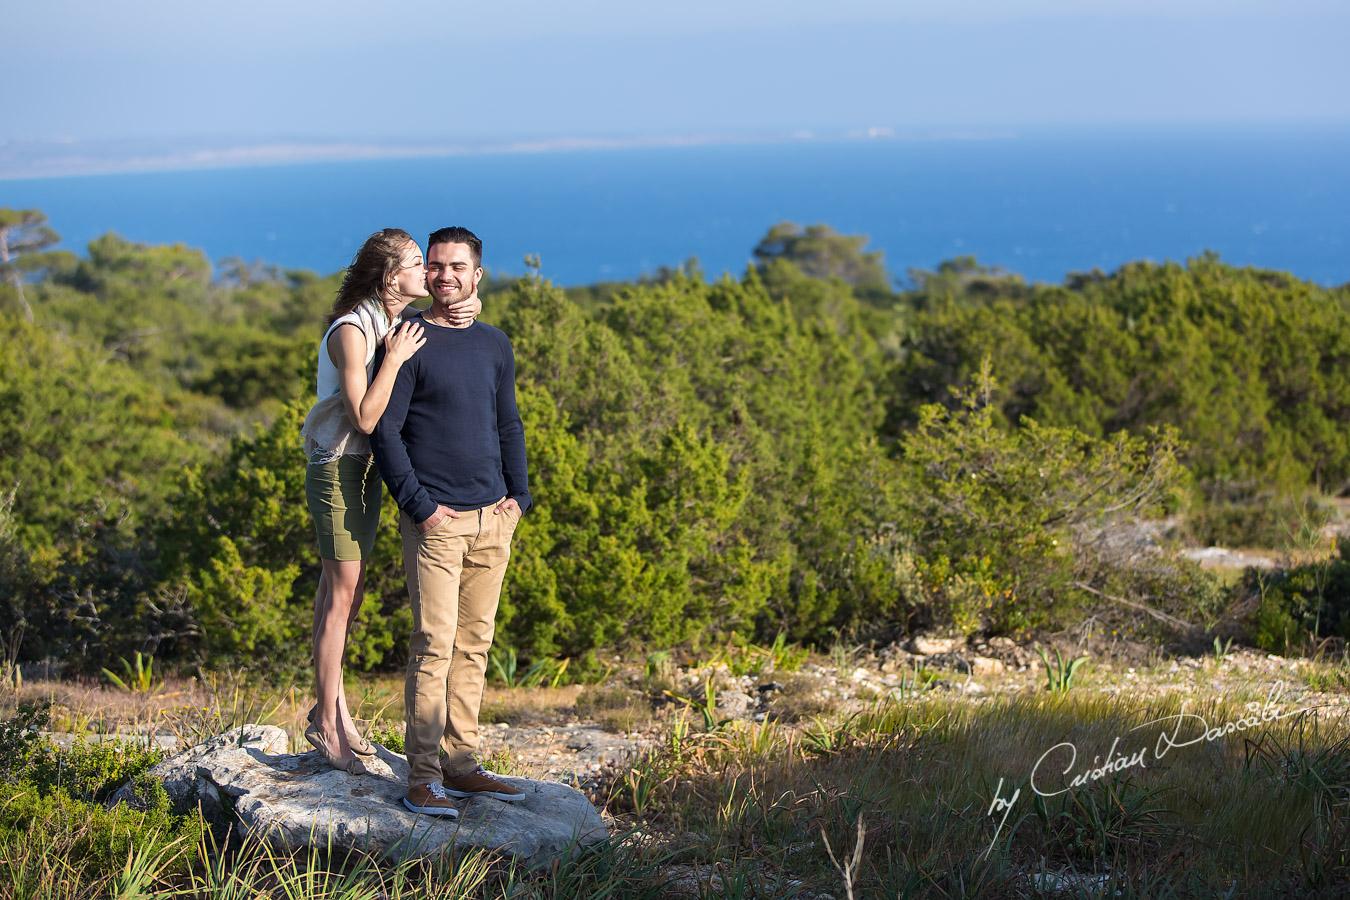 Love at first sight - Karen & Martins at Kurion Cyprus - 03